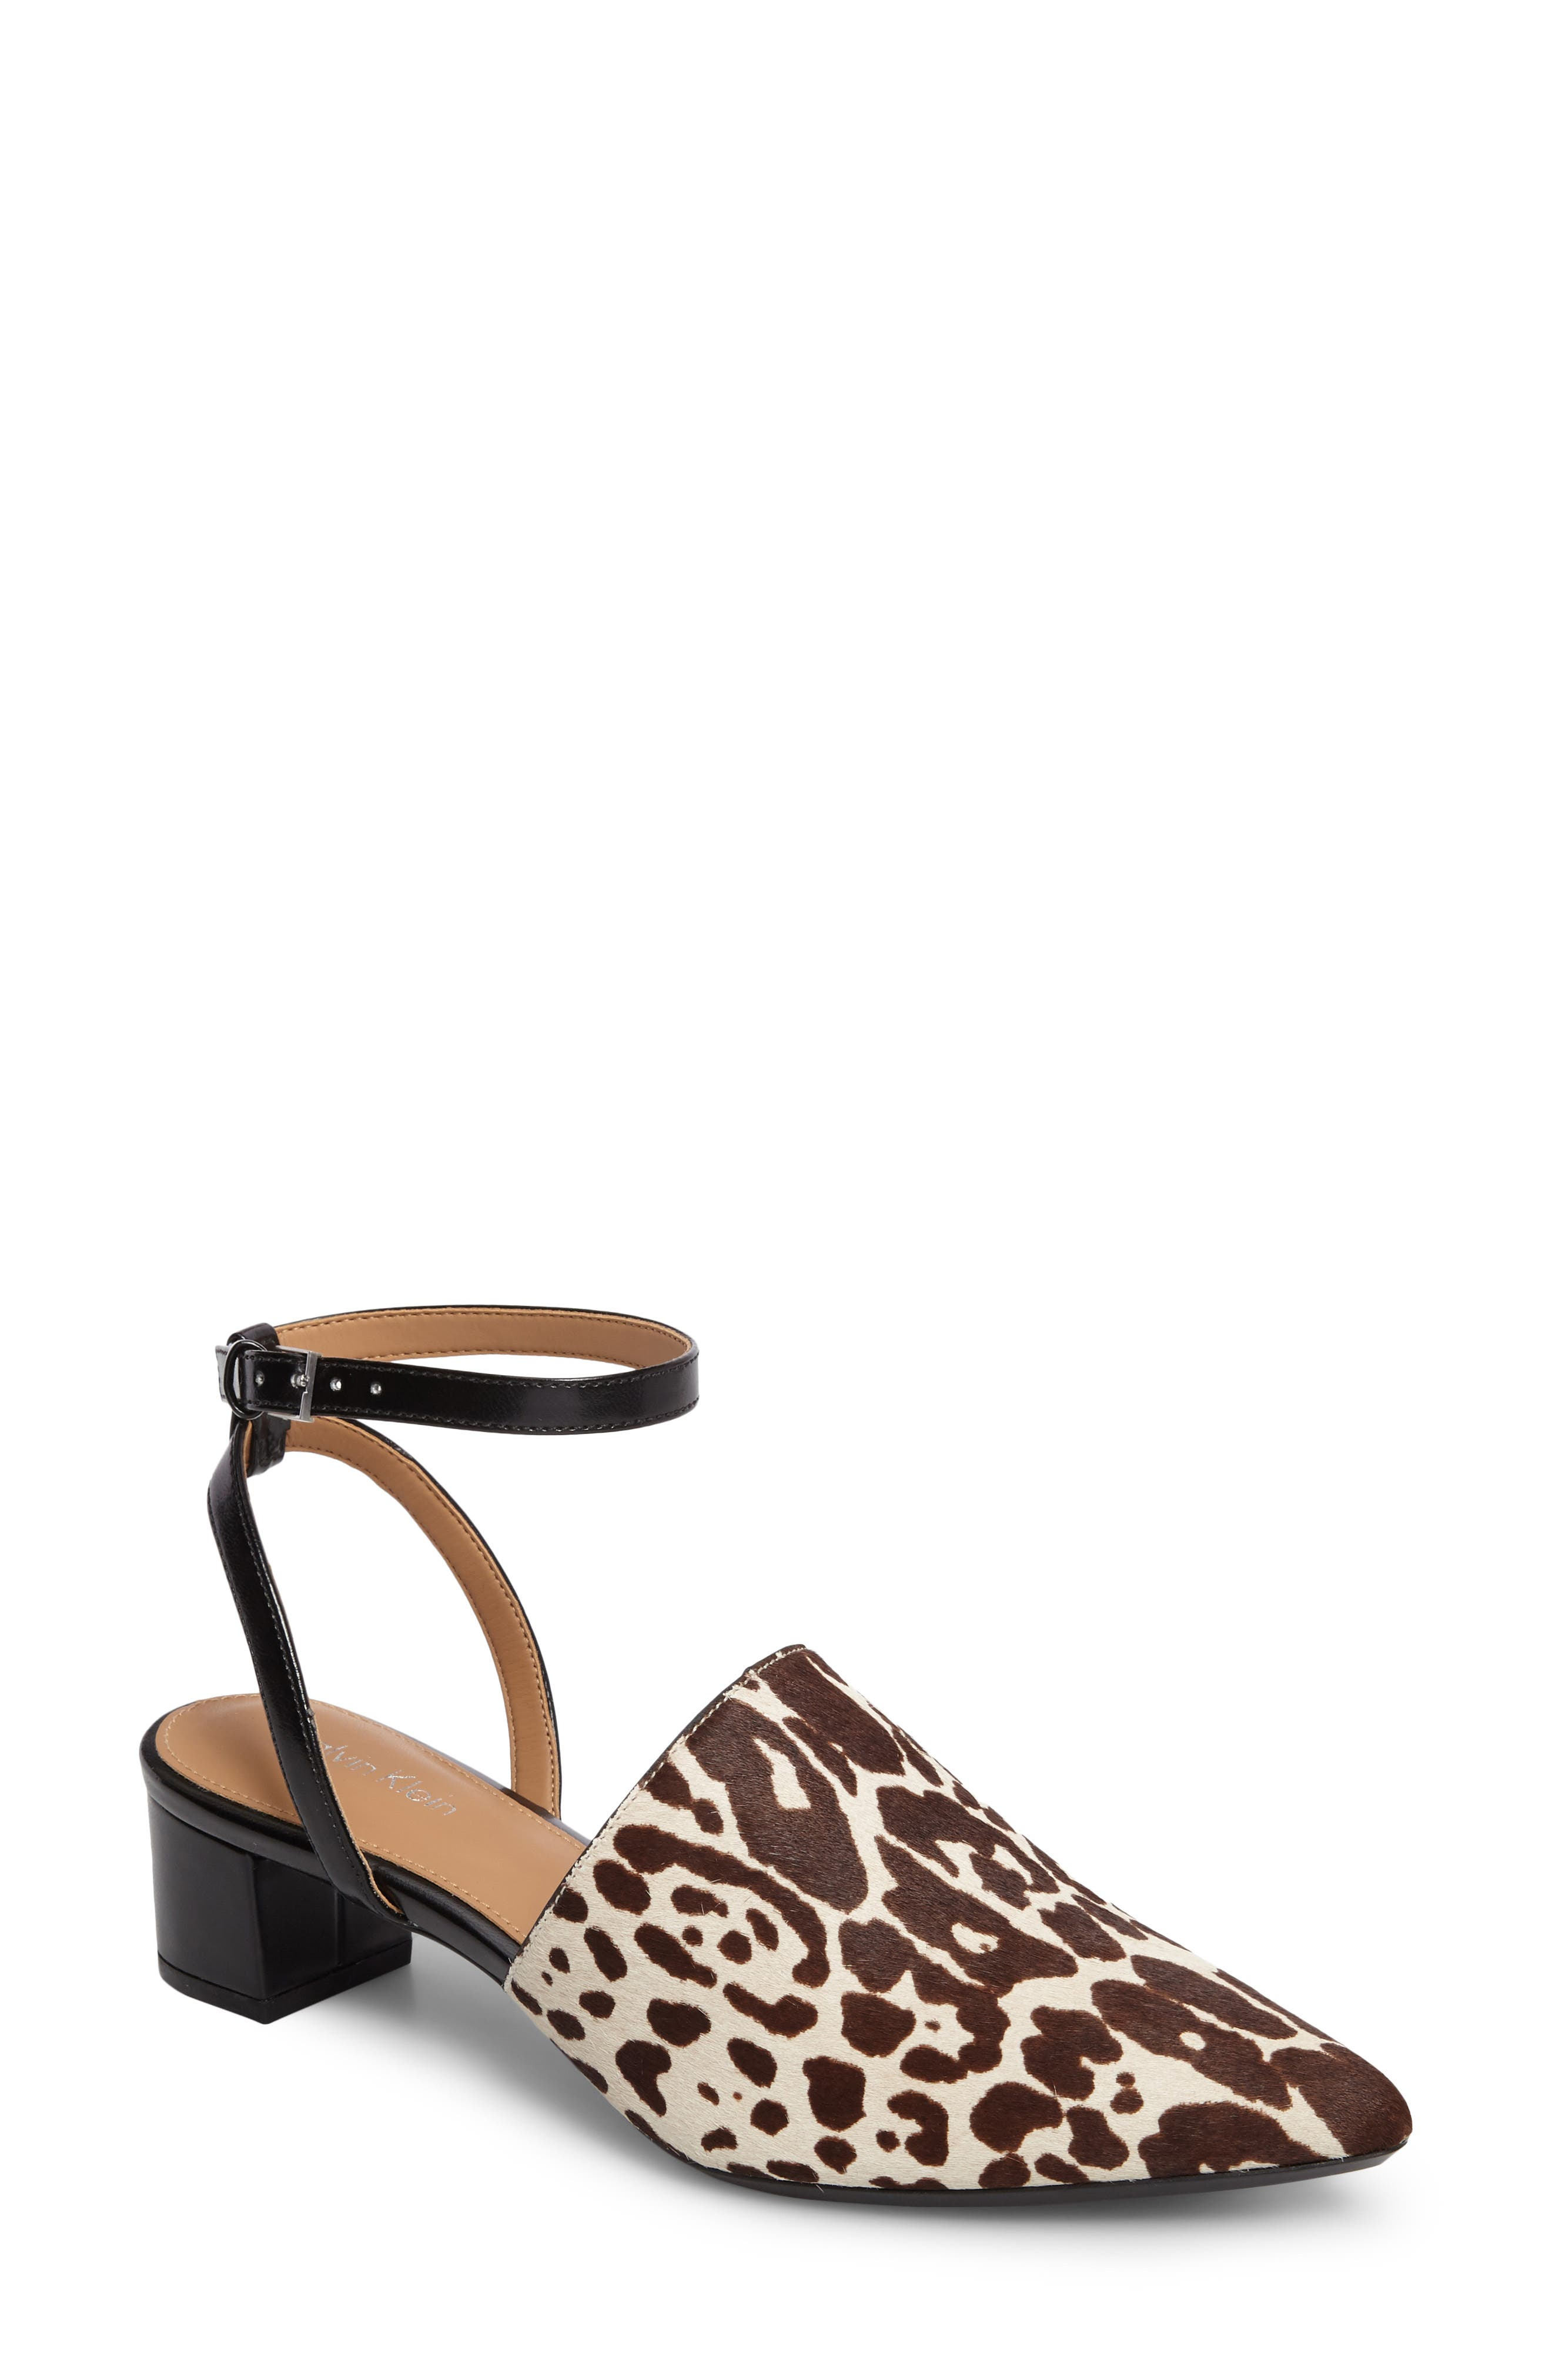 Alternate Image 1 Selected - Calvin Klein Ginetta Ankle Strap Pump (Women)